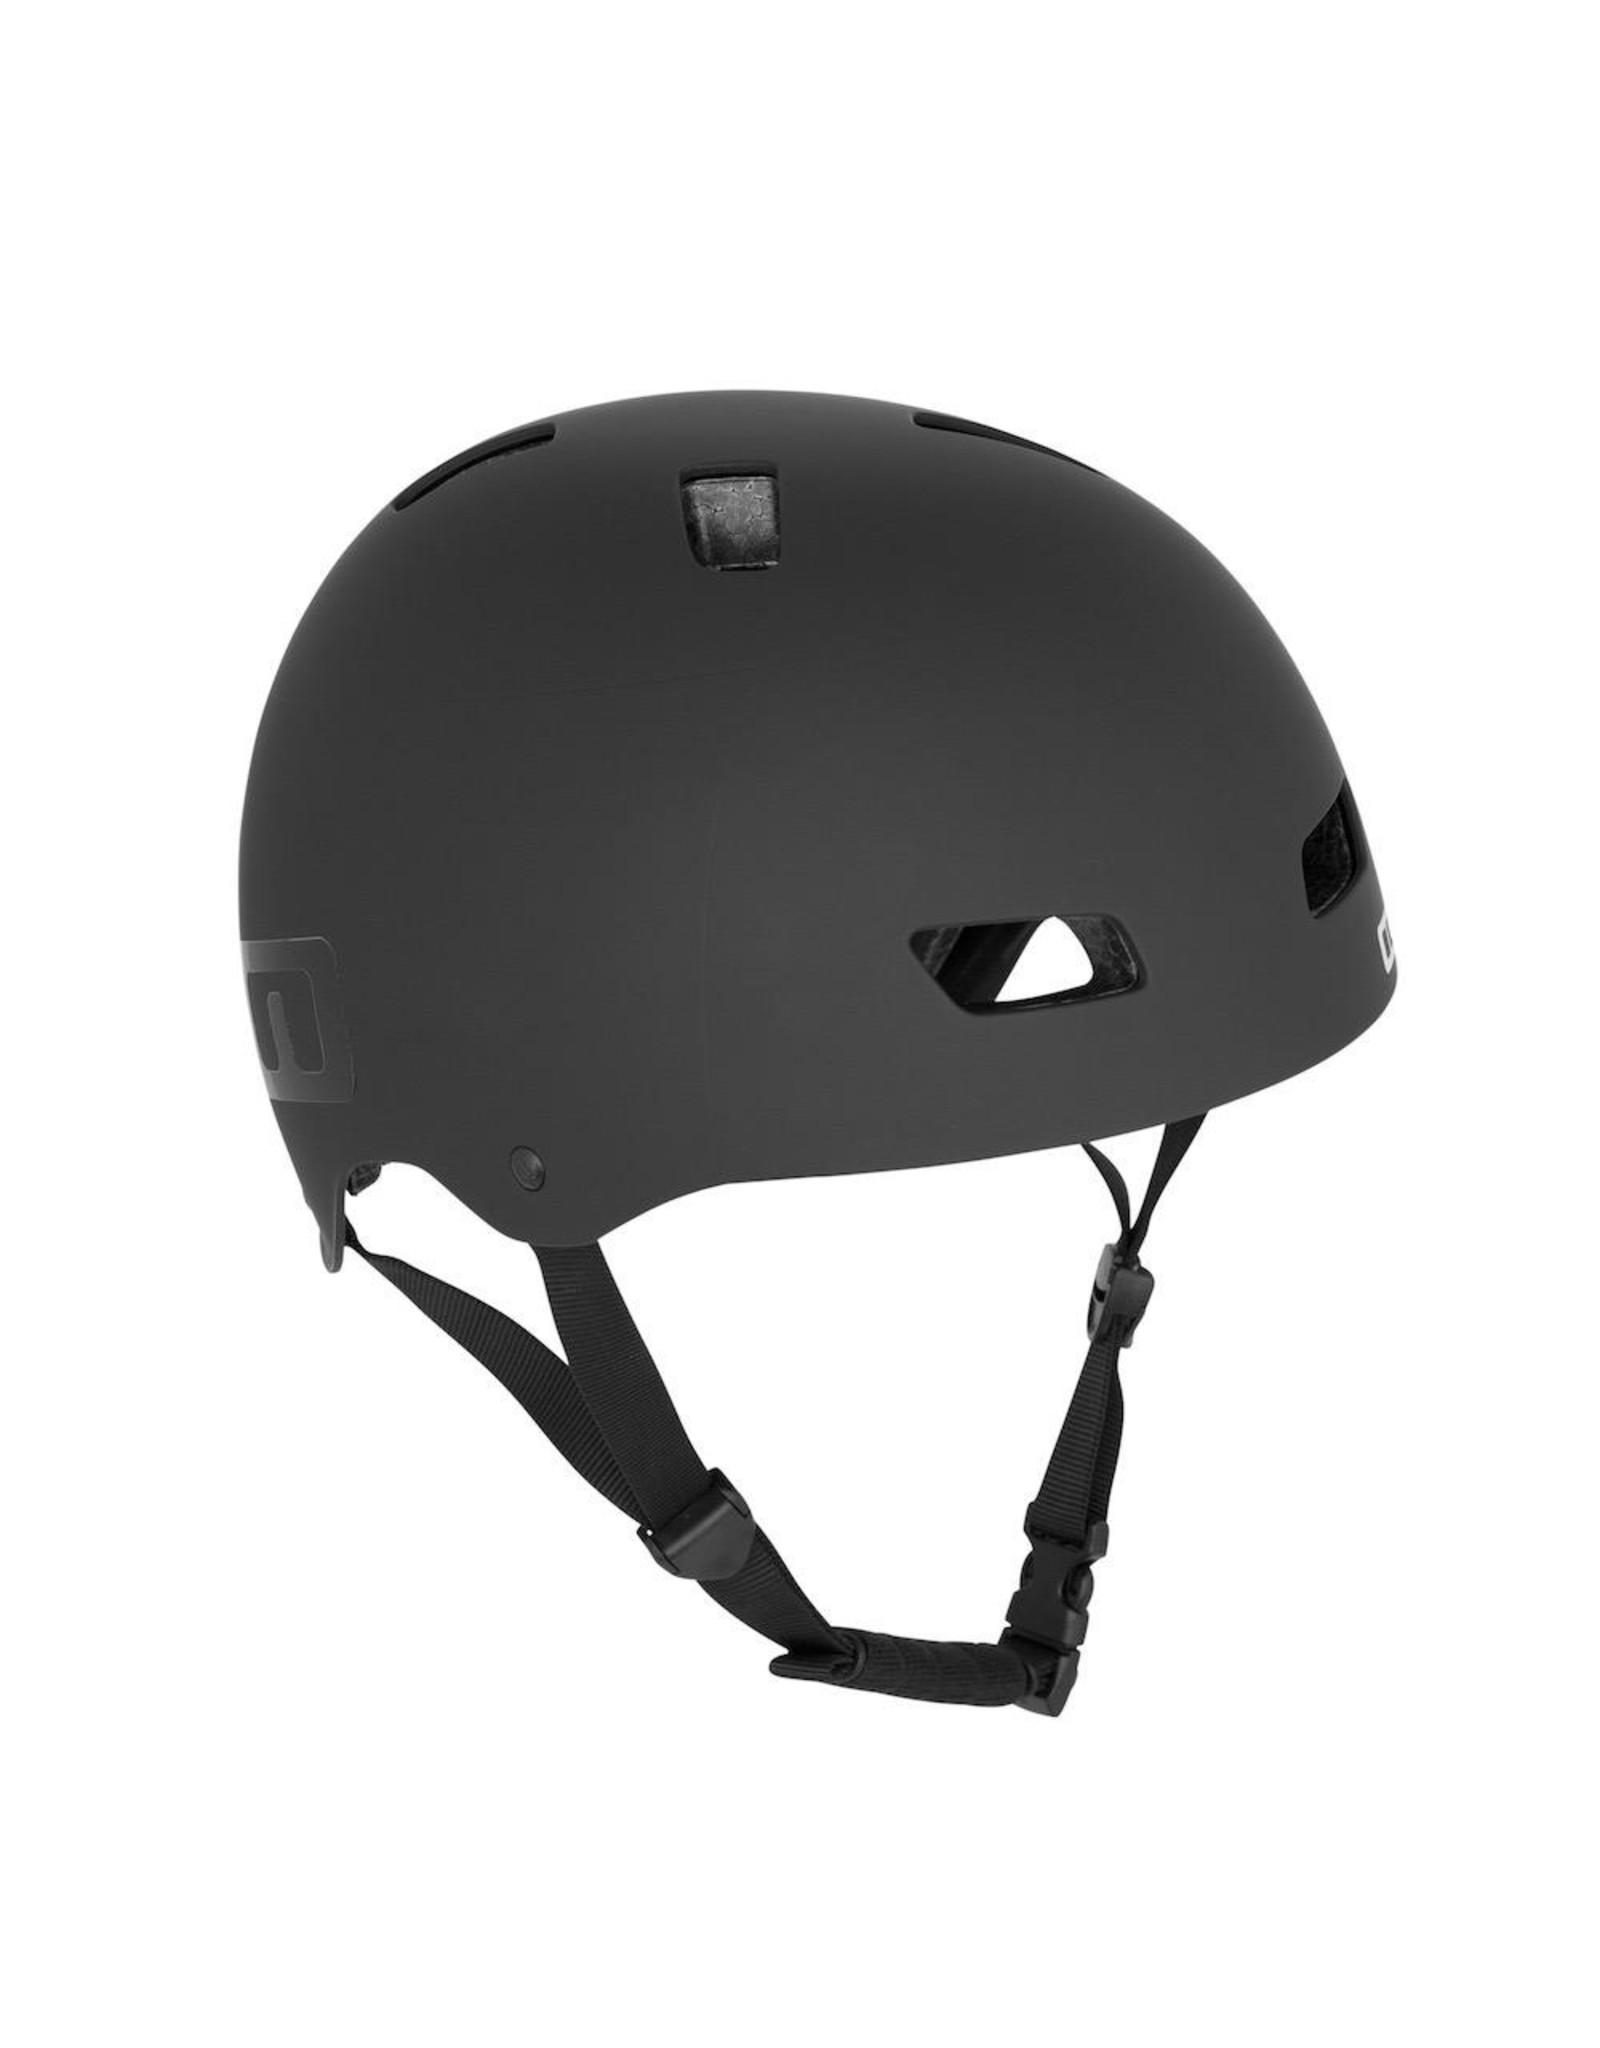 Ion - Hardcap 3.2 - M-L - Black